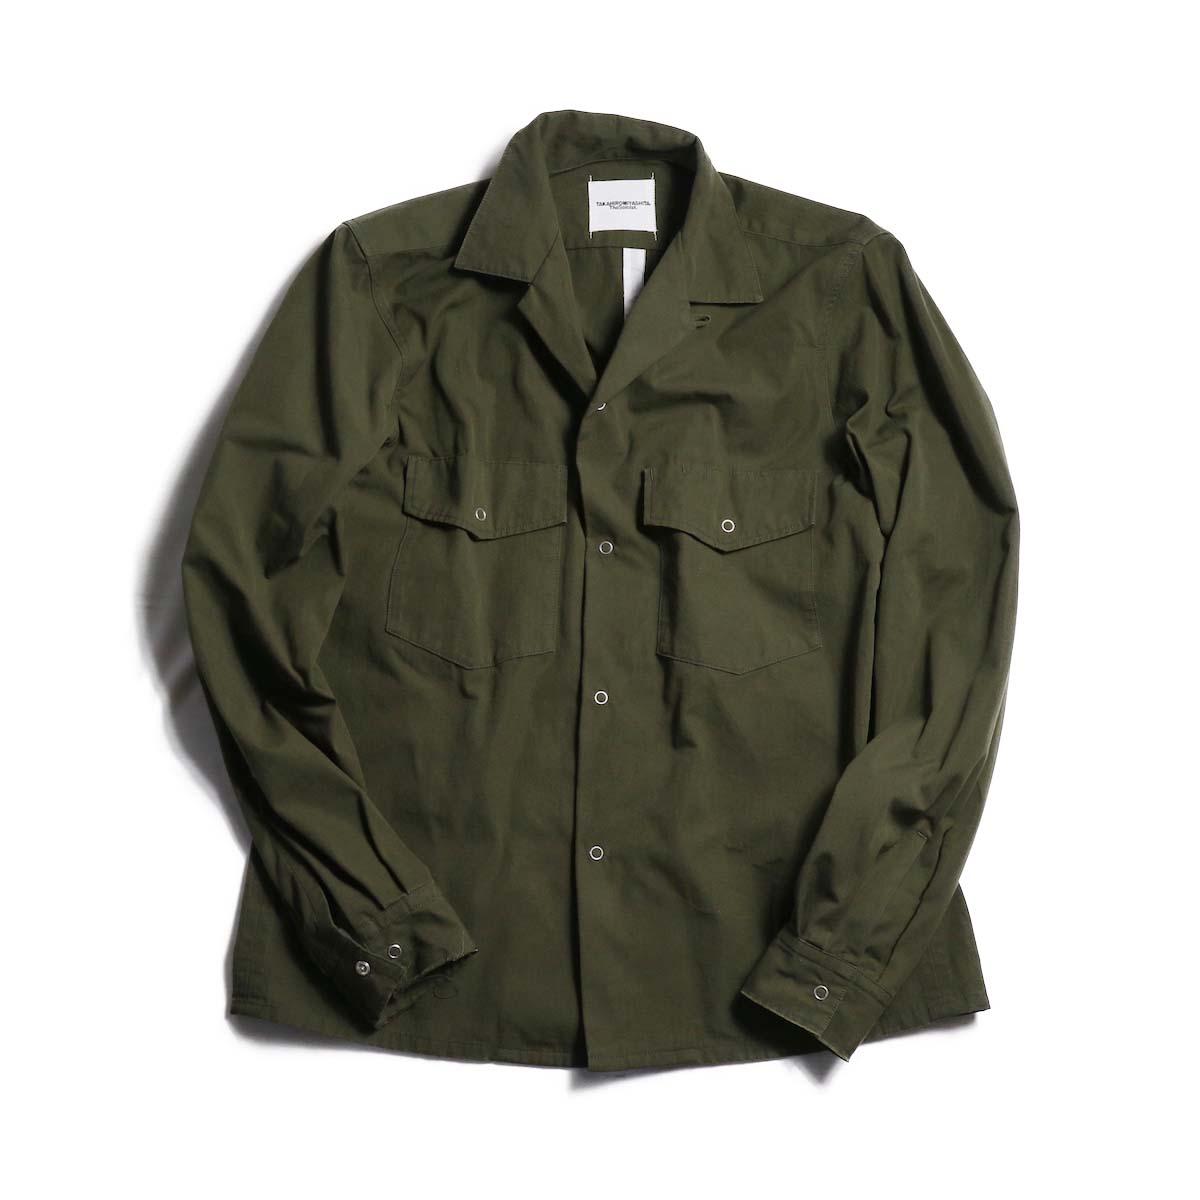 TheSoloist / sws.0010AW18 fatigue shirt.